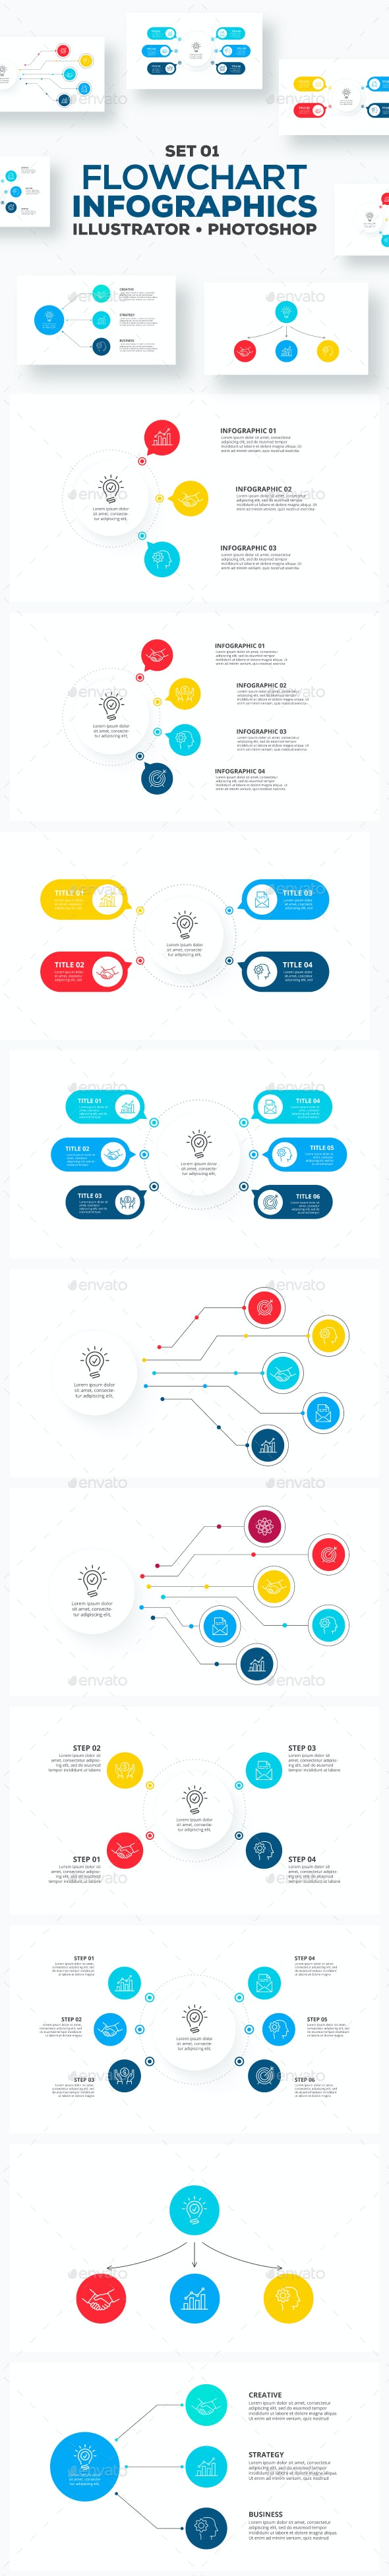 Flowchart Infographics Set 01 - Infographics